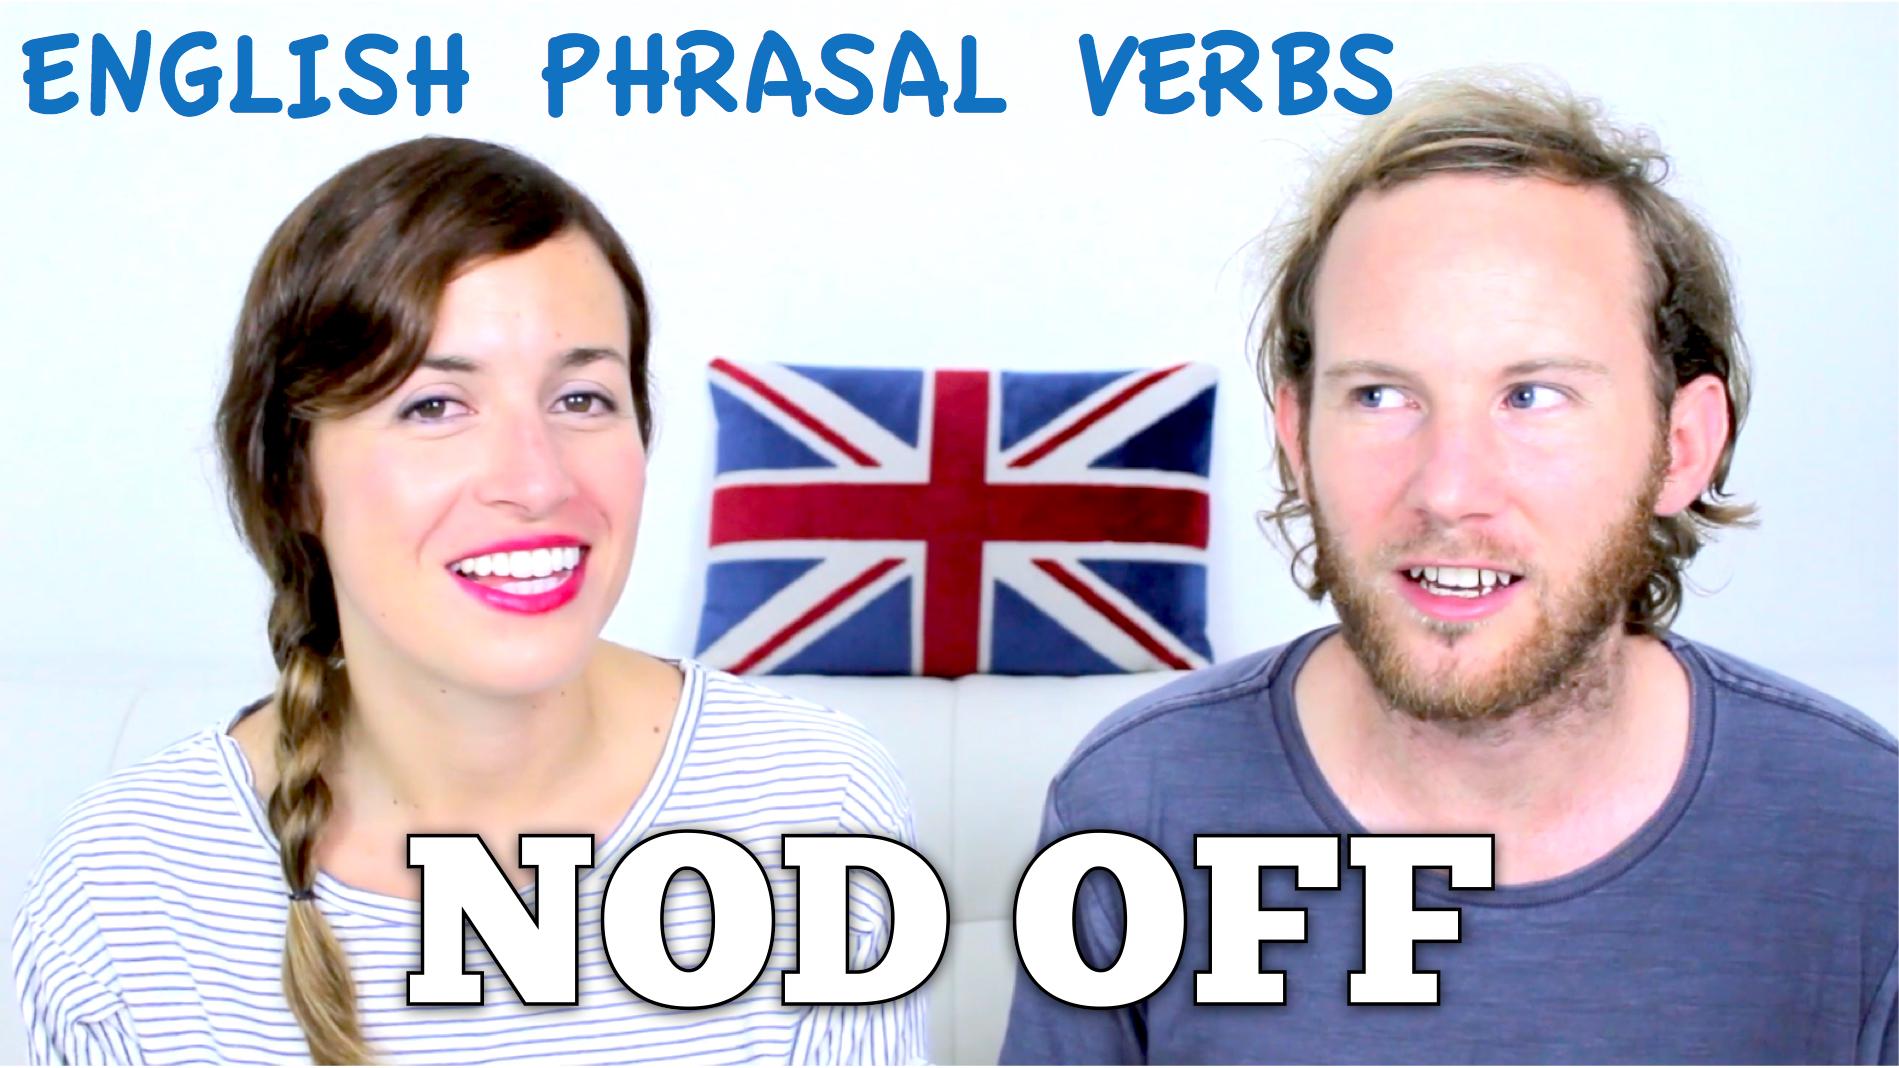 NOD OFF – English Phrasal Verbs